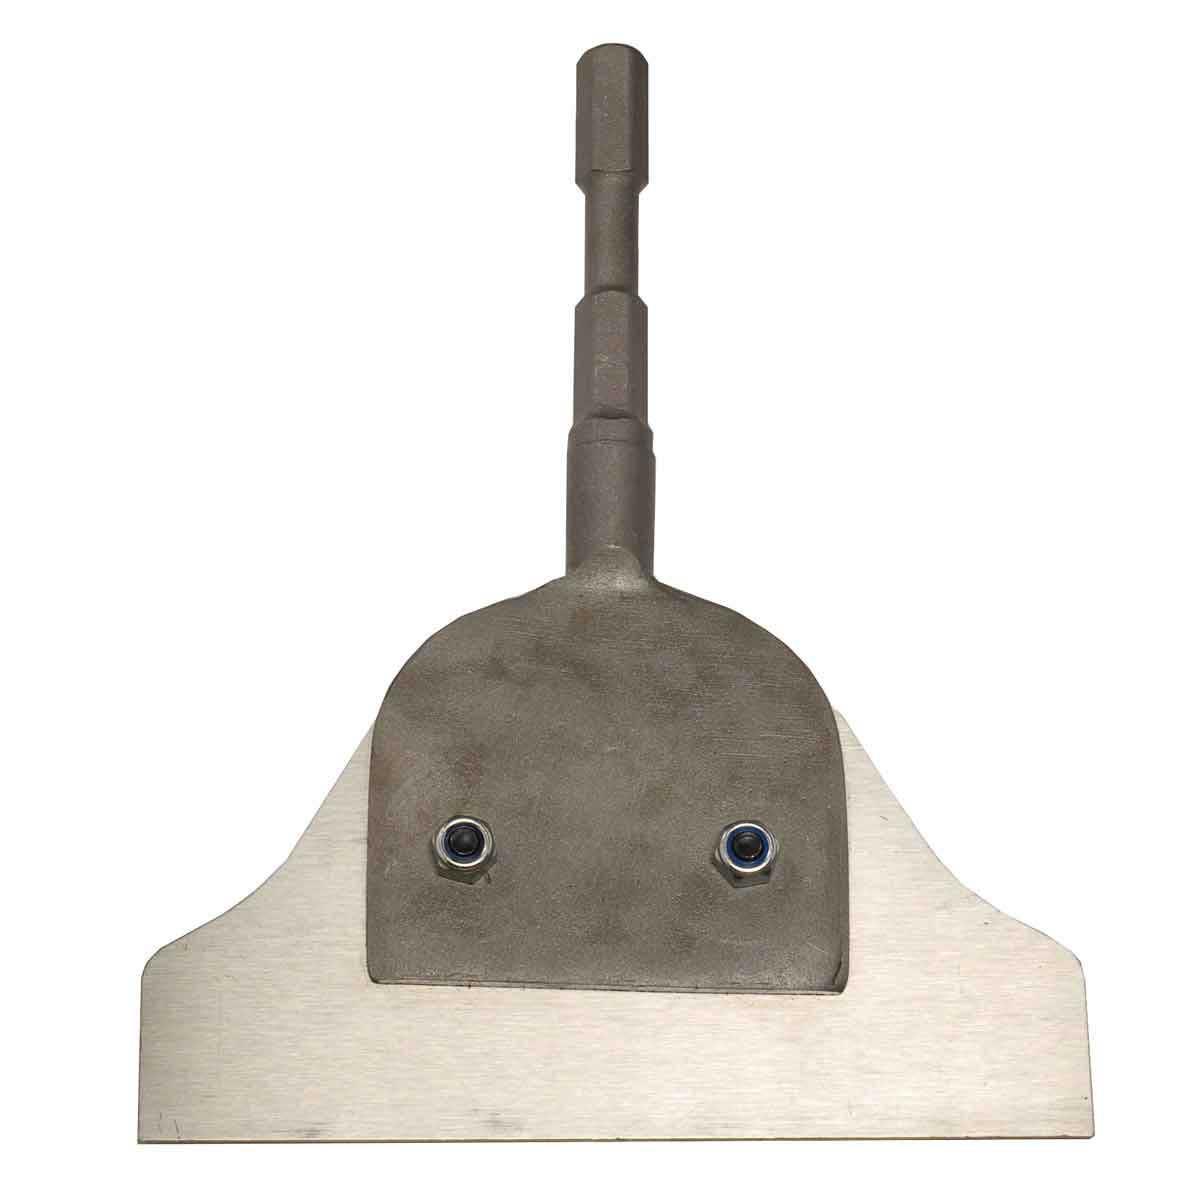 Trelawny Scraper Blade Holder